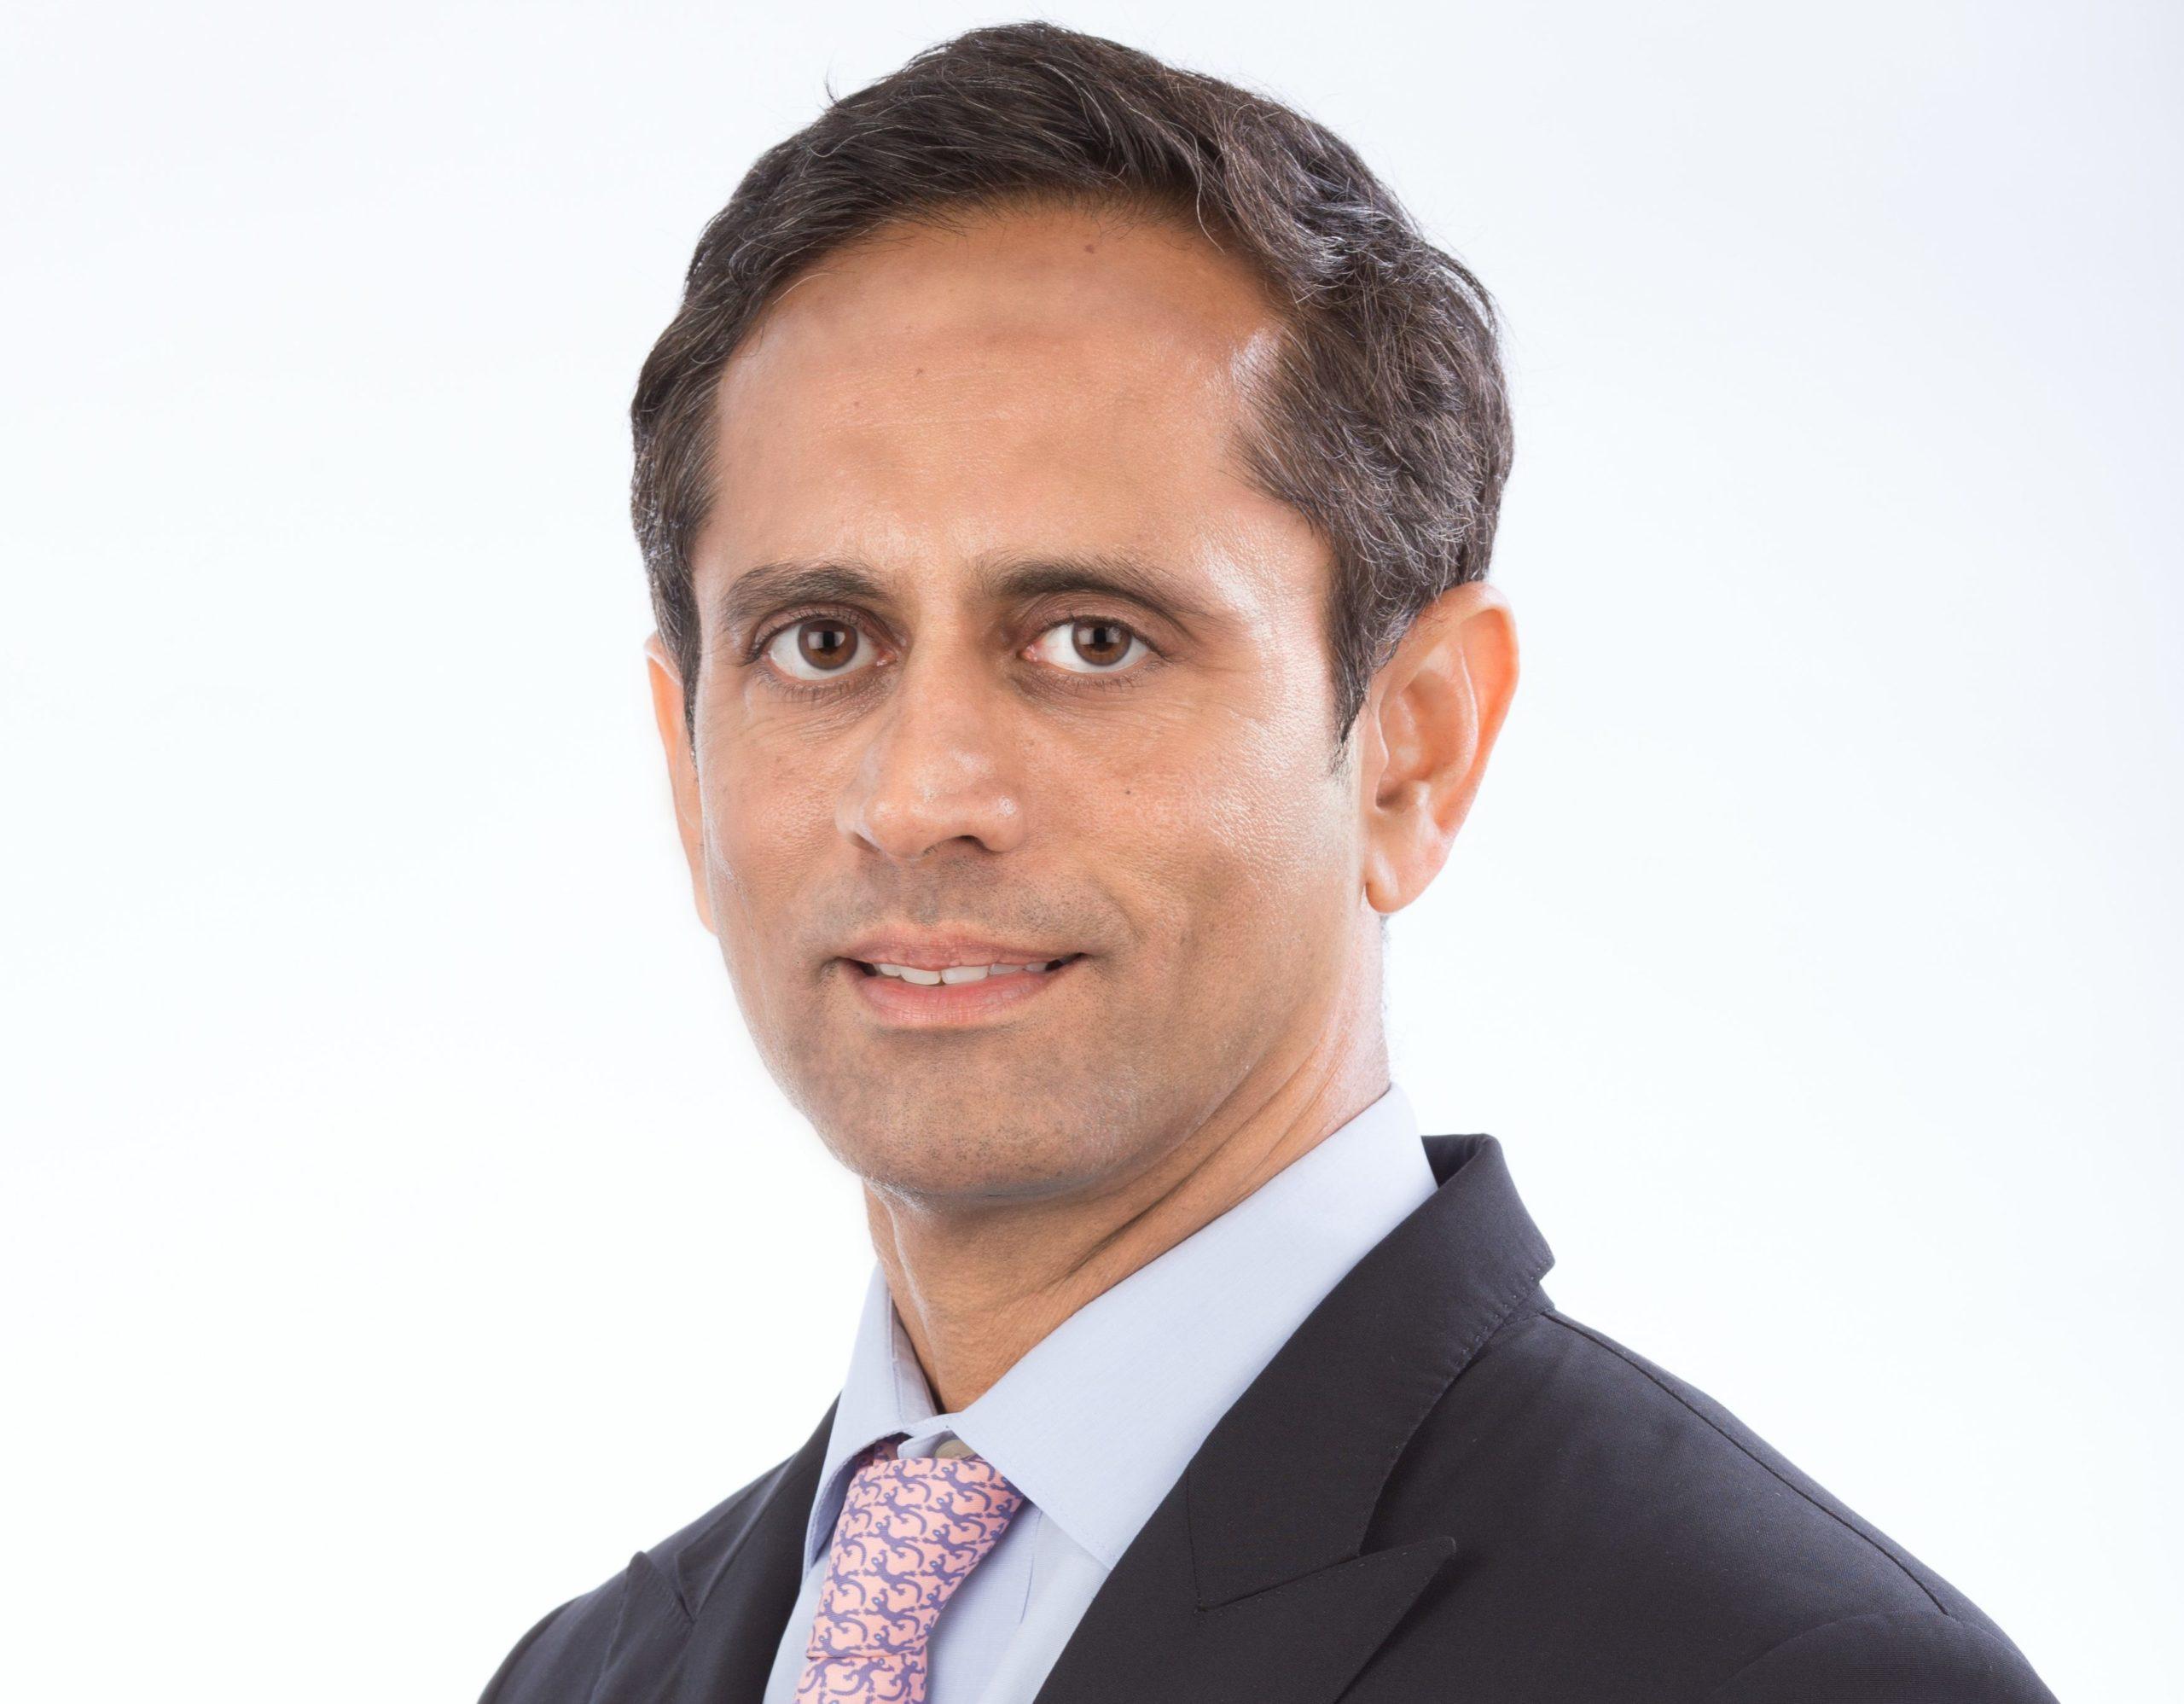 Vinod Kumar, Chief Executive Officer and Managing Director, Tata Communications